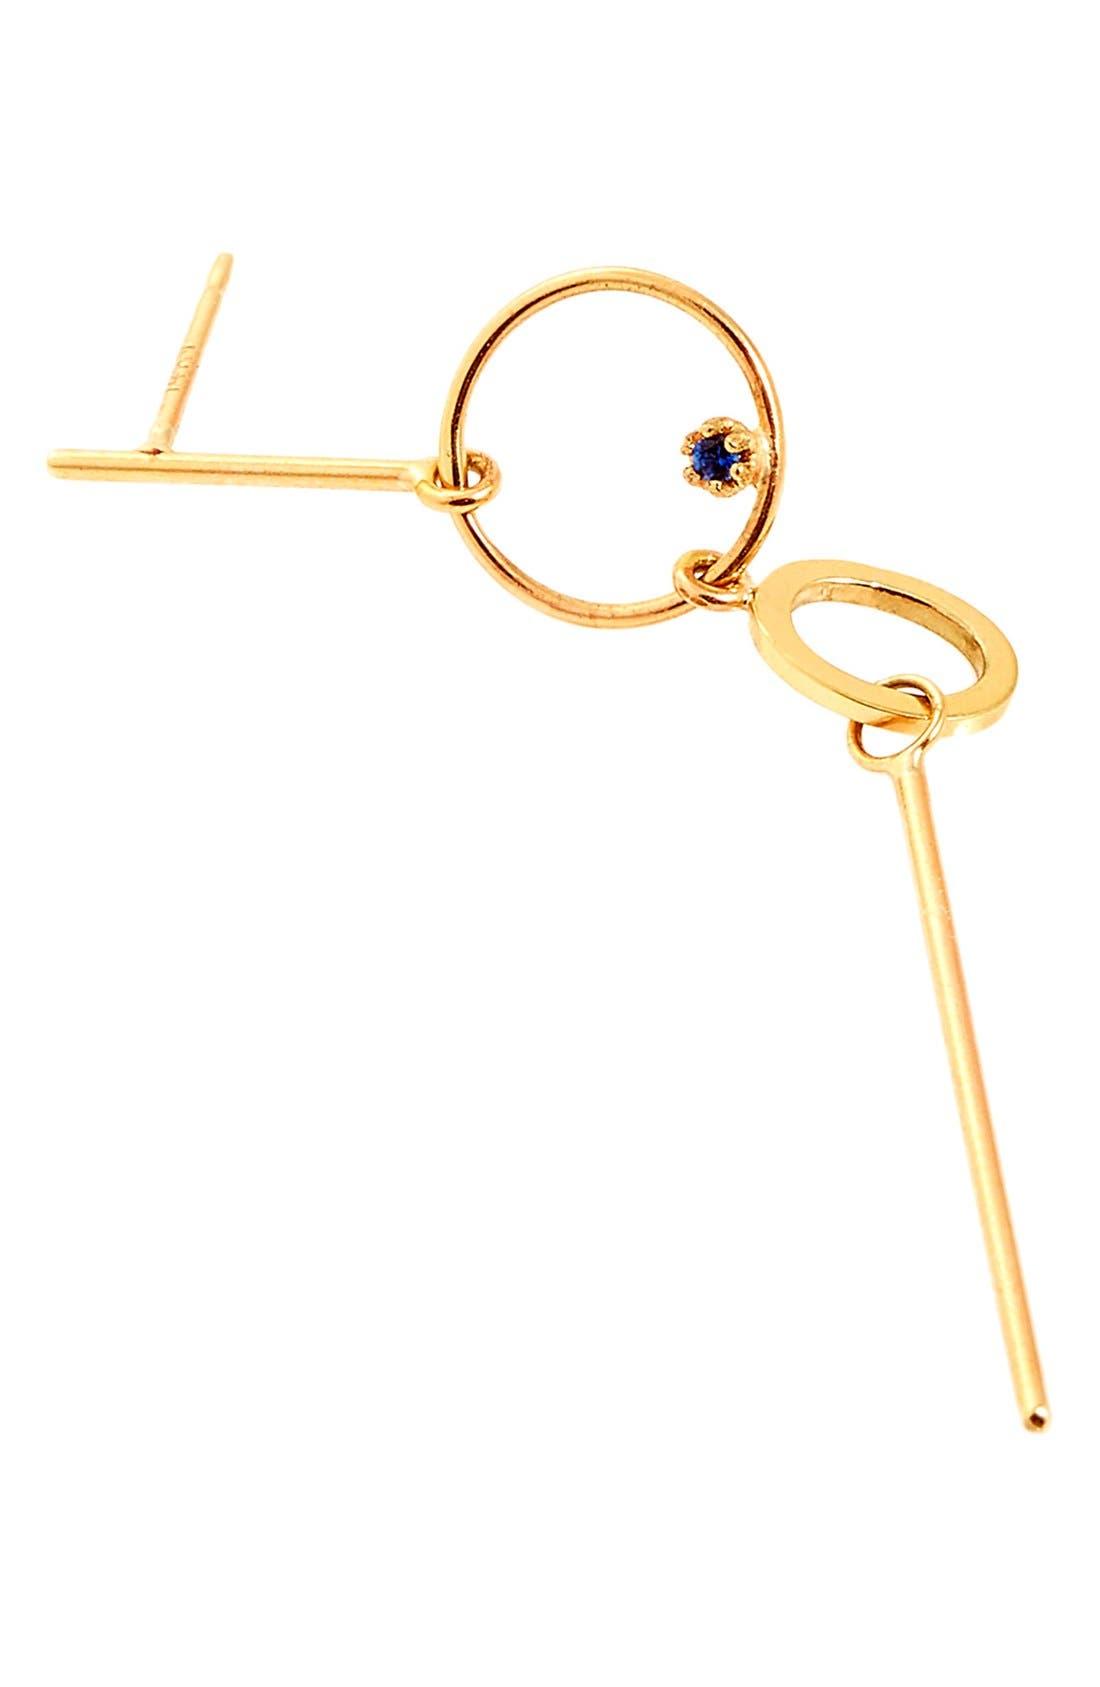 Main Image - SARAH & SEBASTIAN 'Long Bubble' Gold & Sapphire Statement Earring